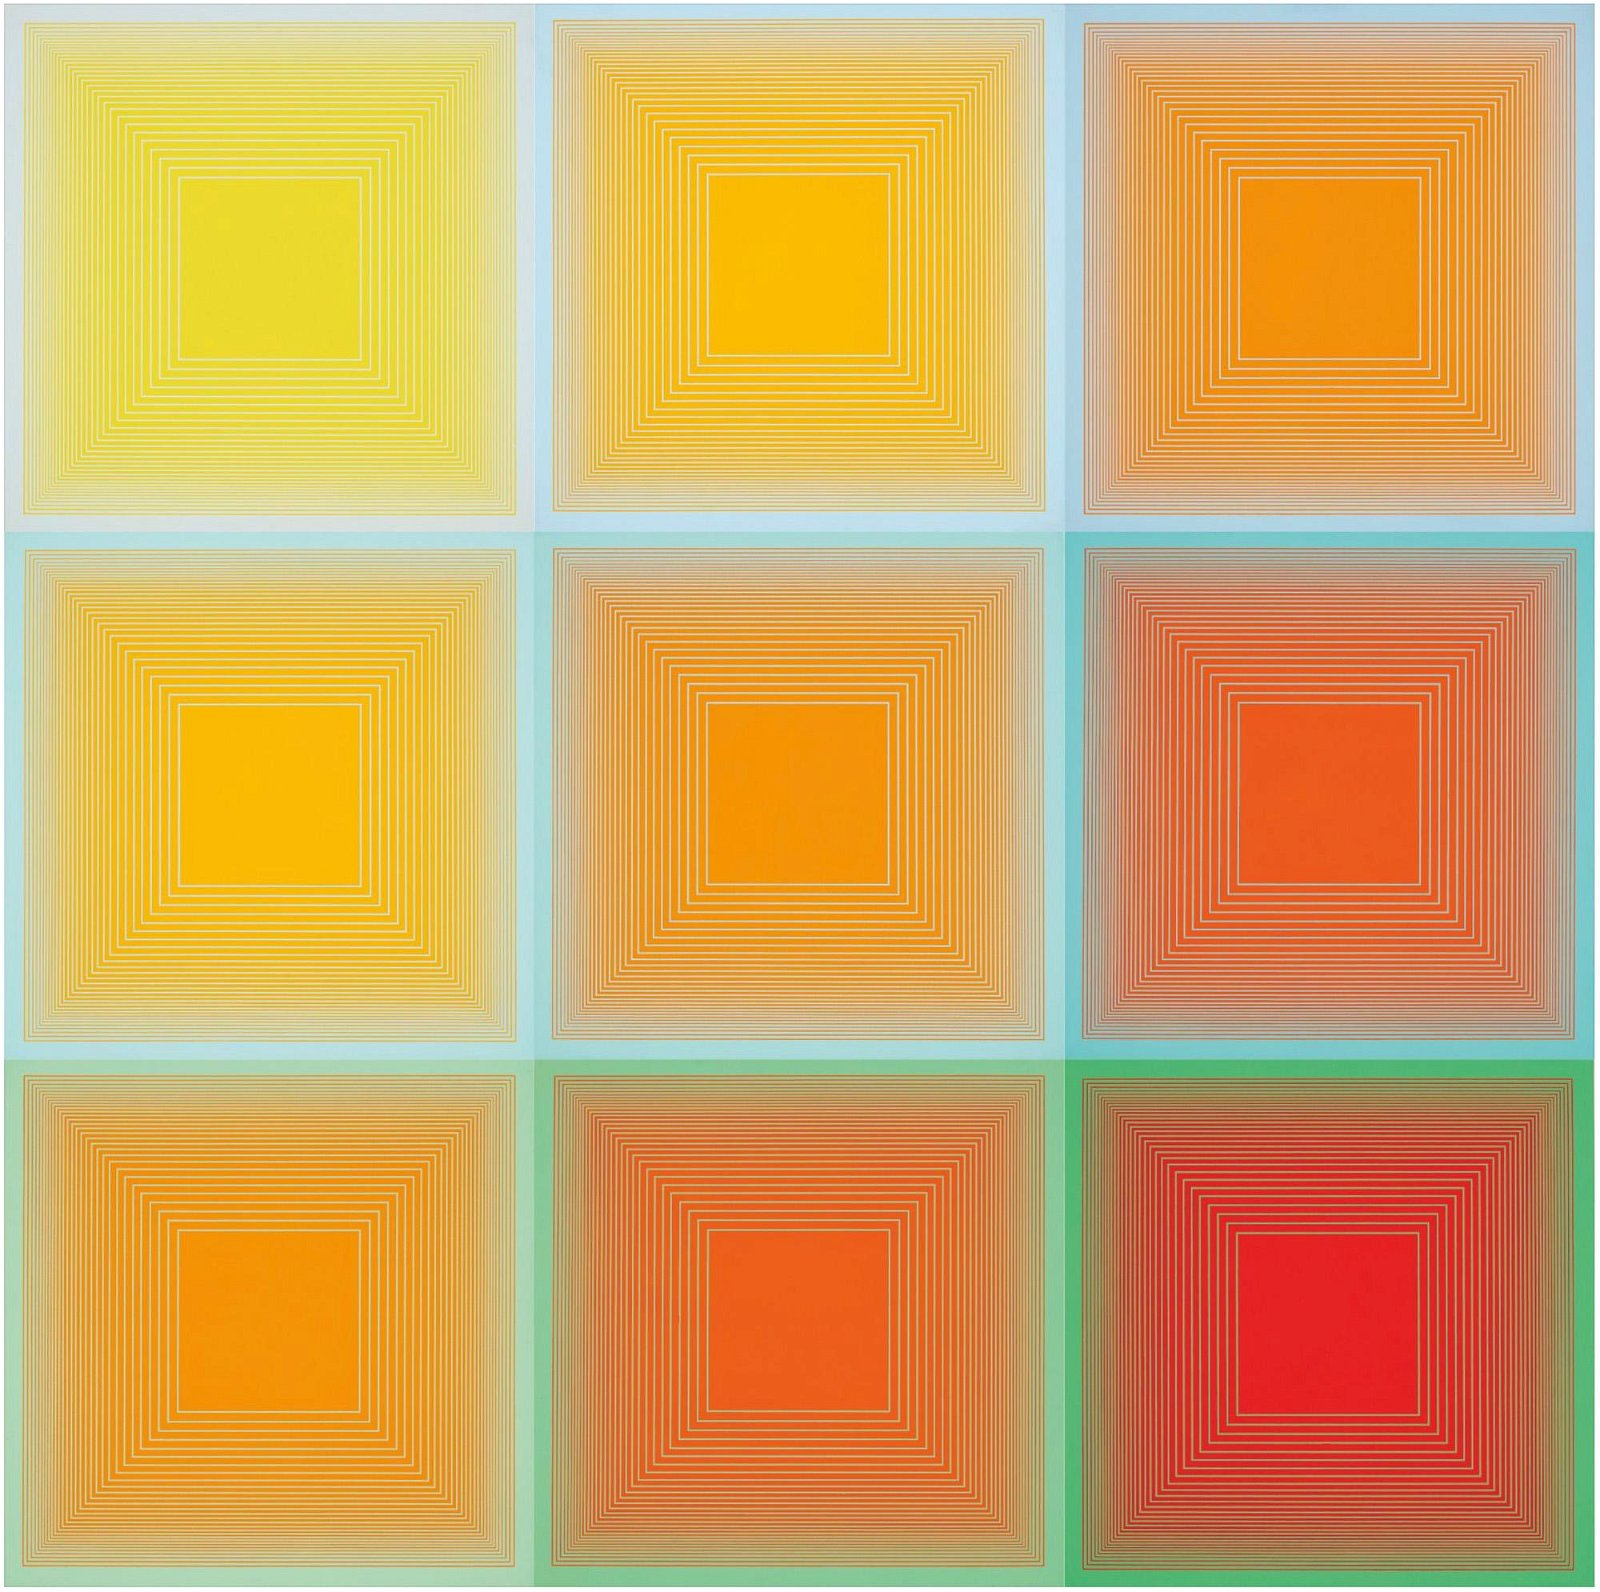 Richard Anuszkiewicz (b. 1930) Spectral 9 - A Variable